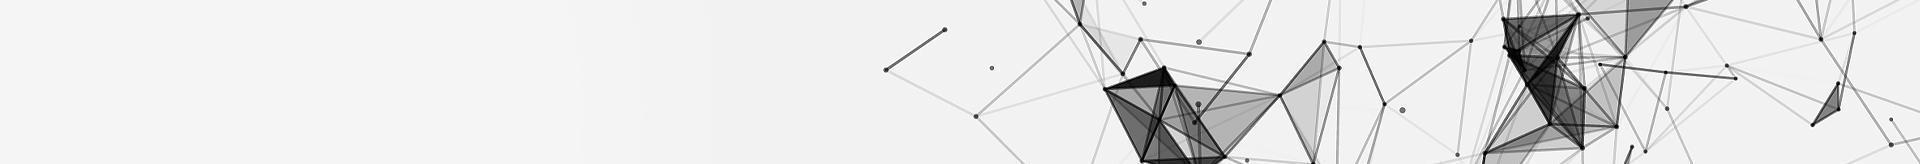 punkty kreski różne kształty baner